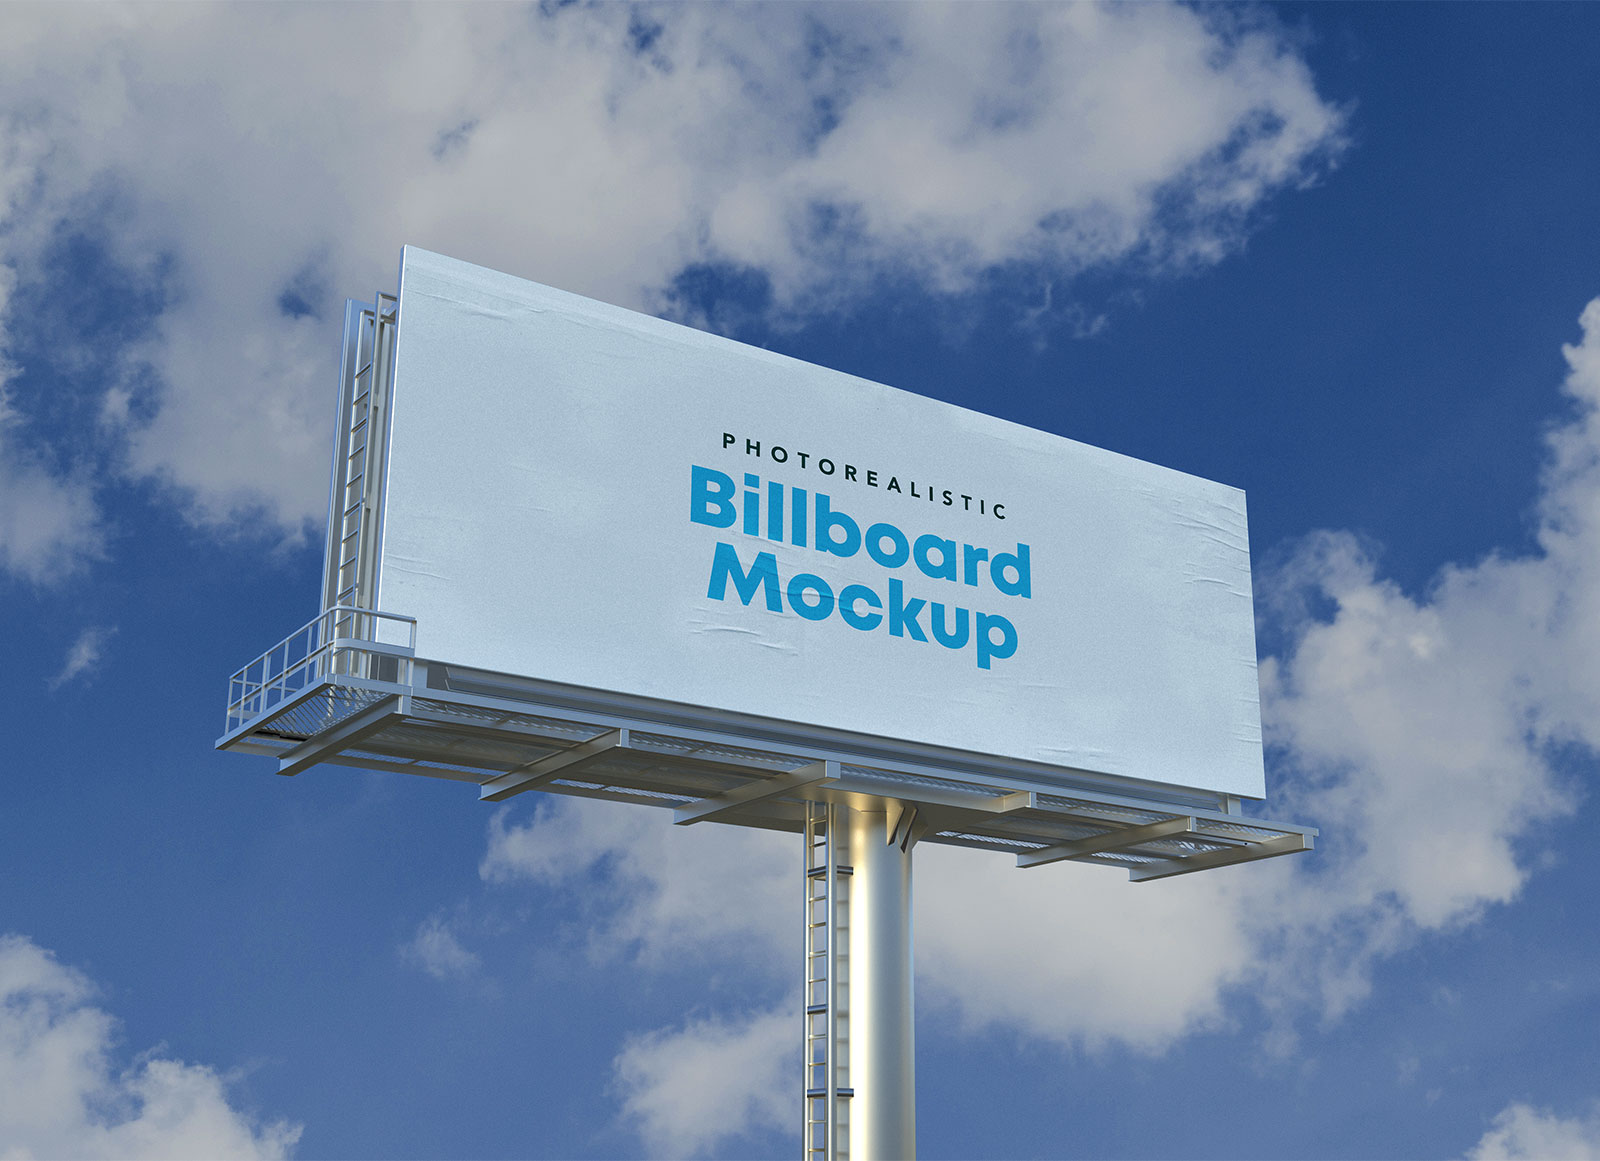 Free Photorealistic Advertisement Billboard Mockup PSD